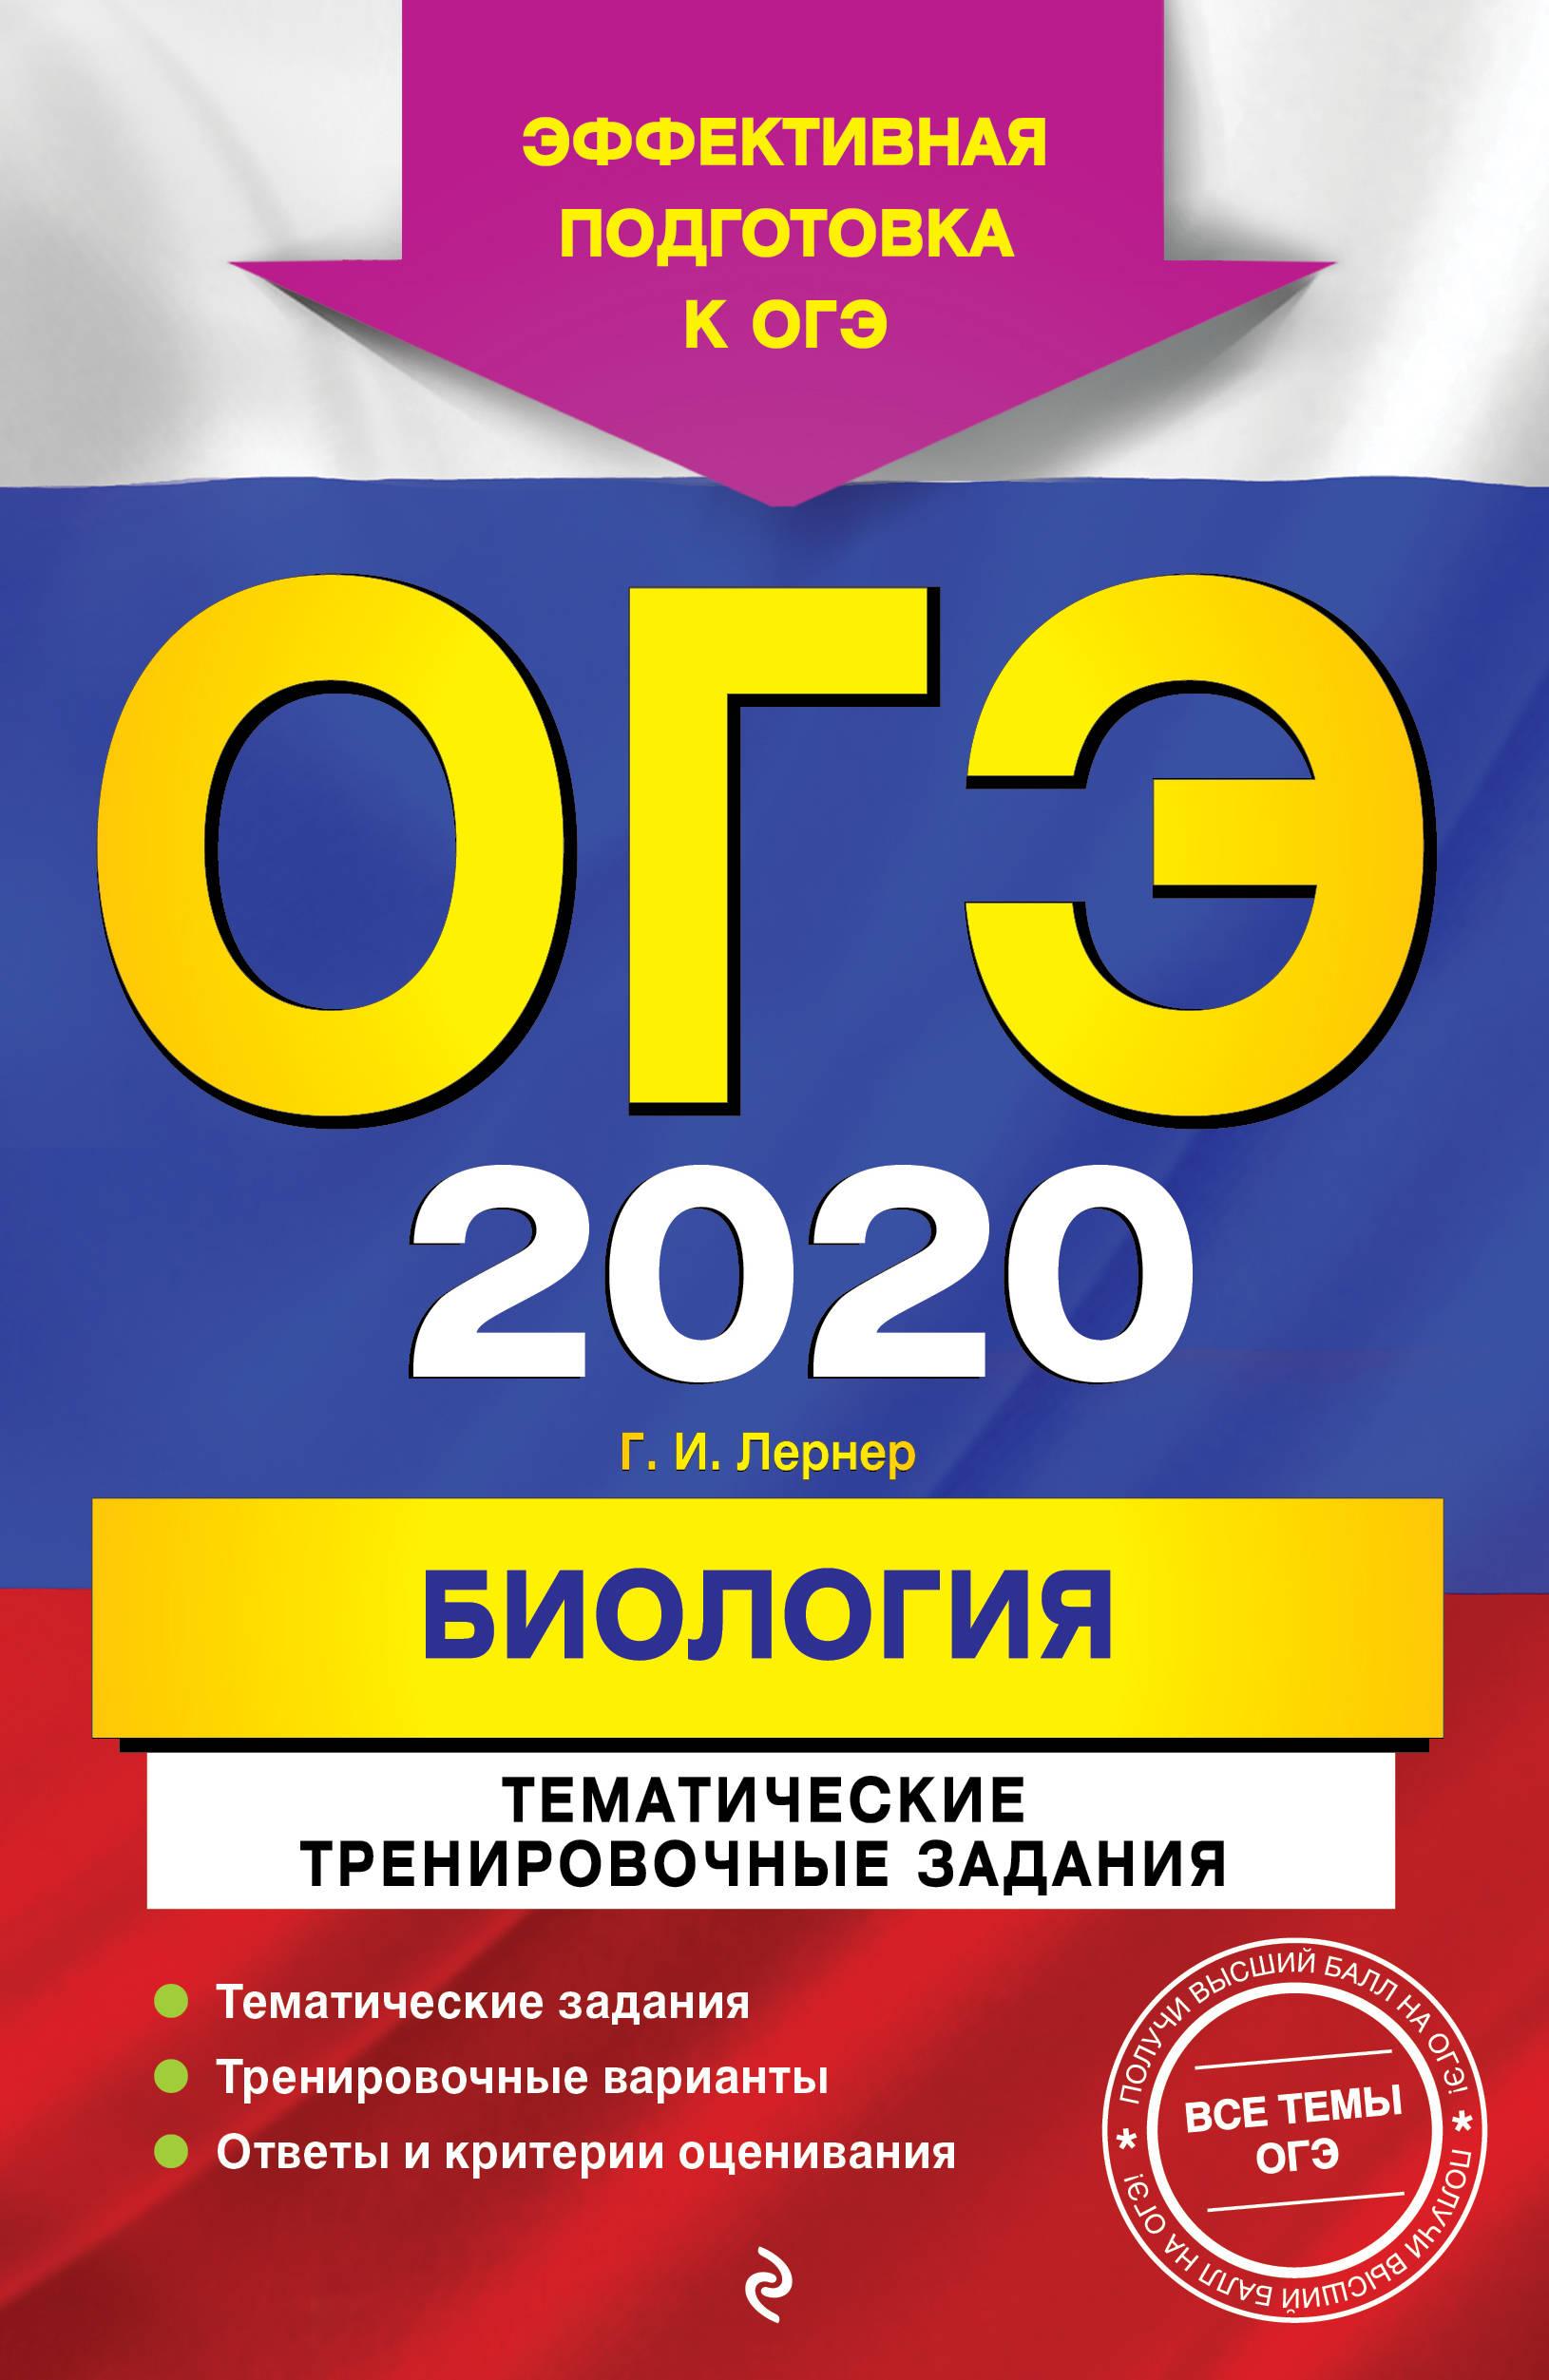 OGE-2020. Biologija. Tematicheskie trenirovochnye zadanija